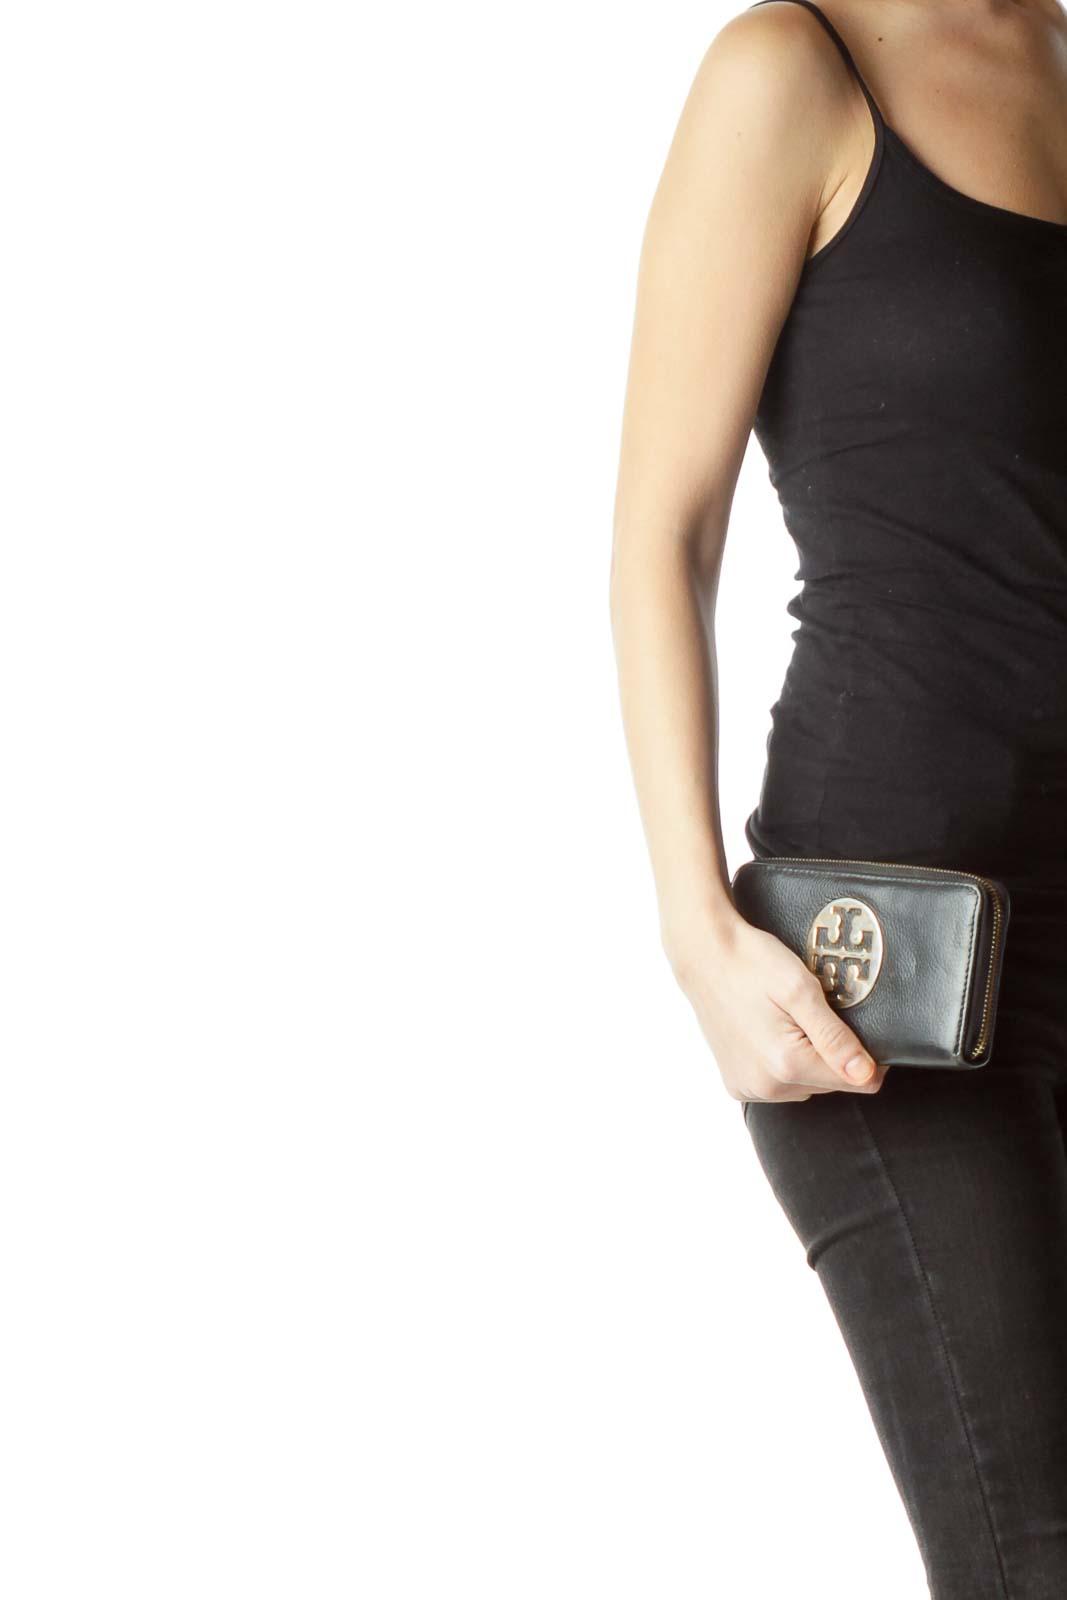 Wristwatch by Versace